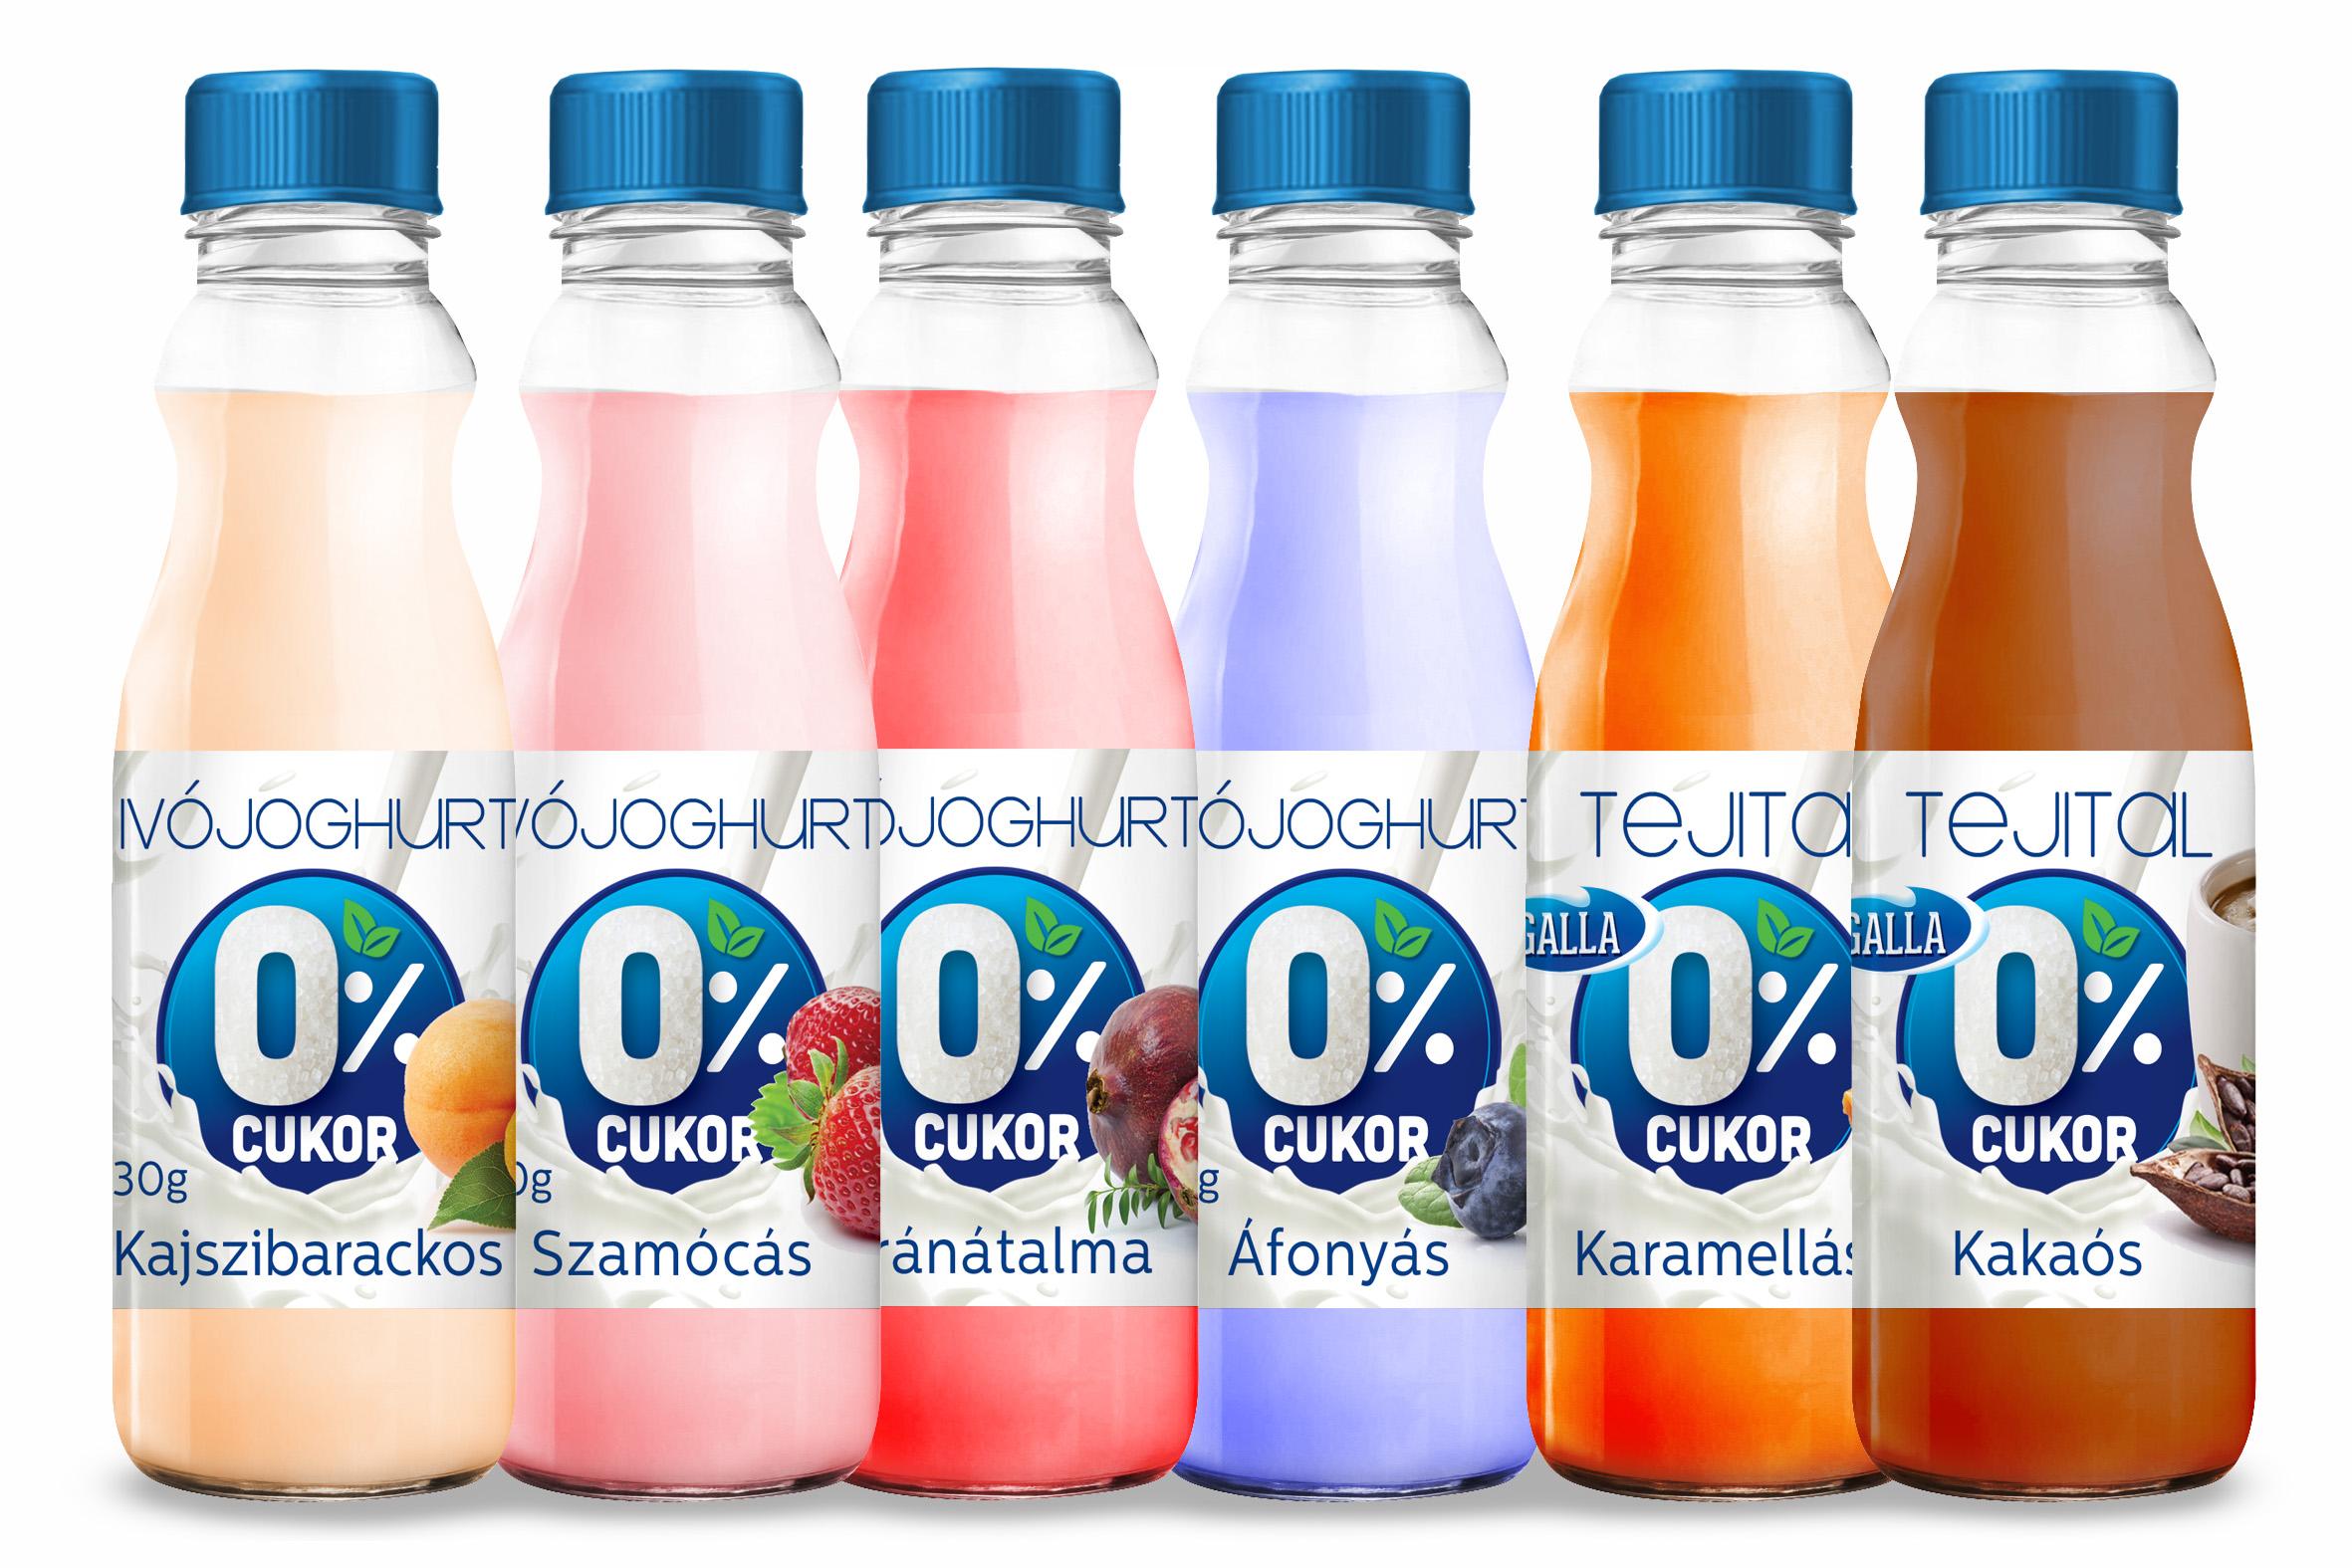 Cukormentes joghurtok, ivójoghurtók, kakaó